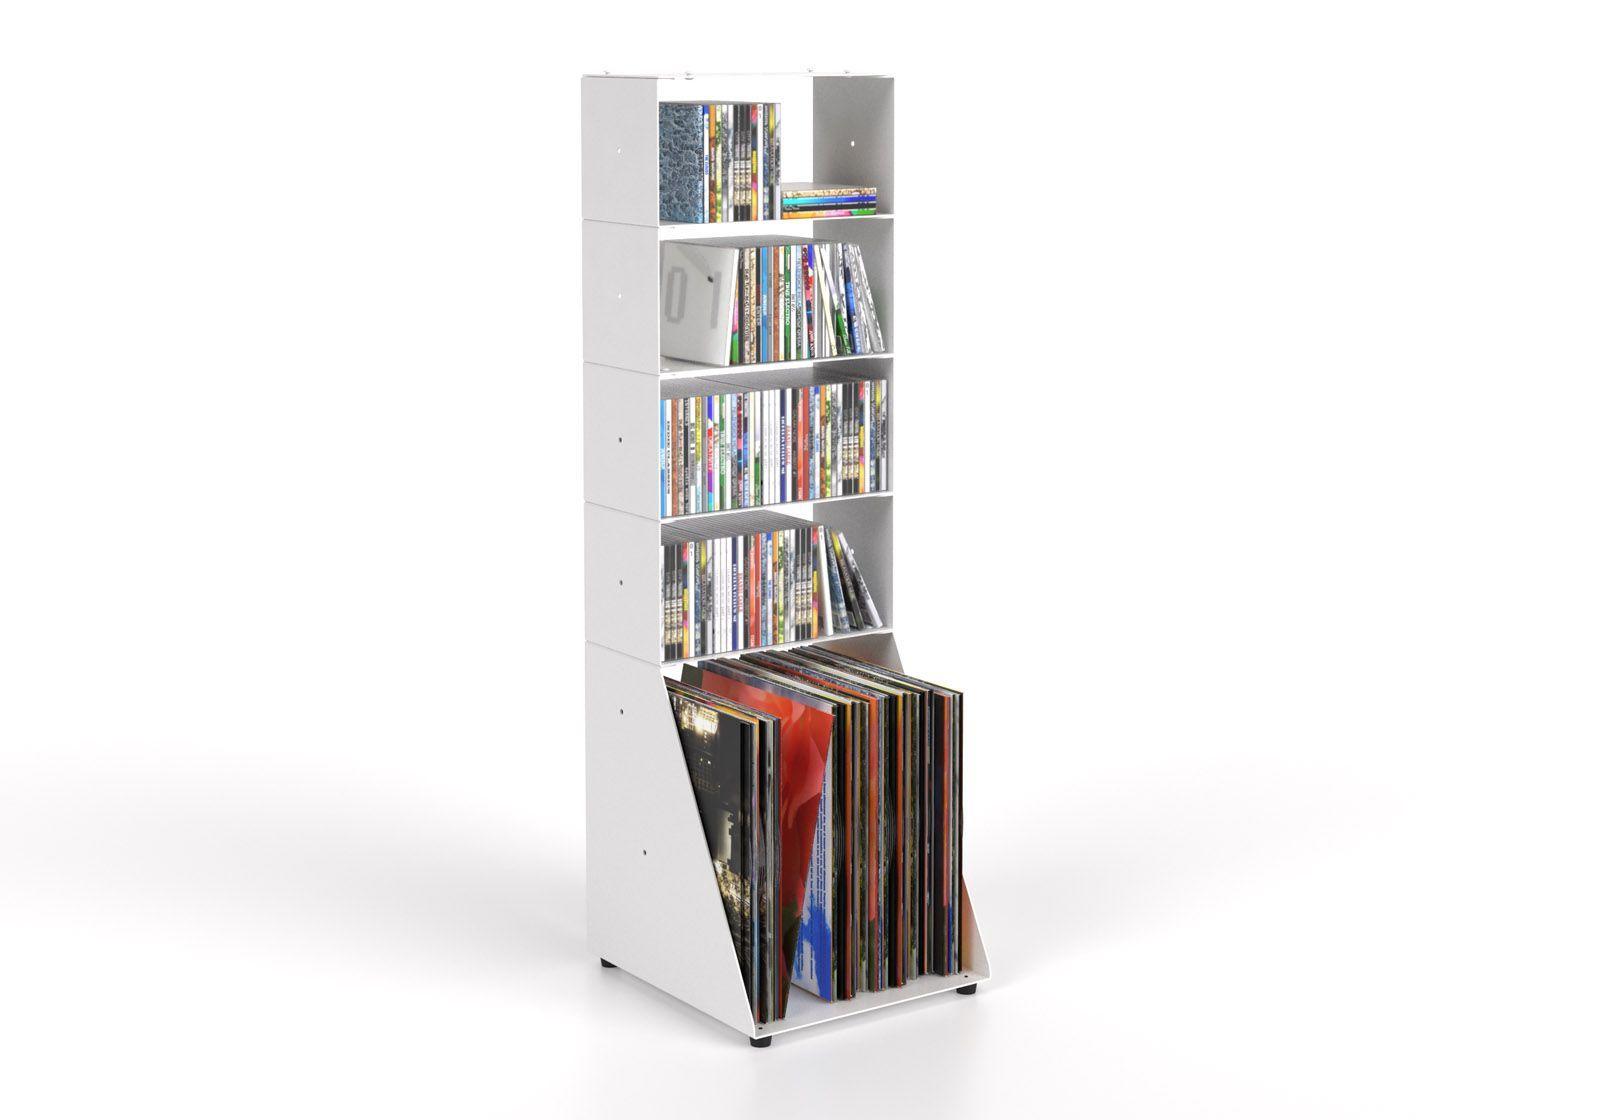 Cd & vinyl storage W30 H95 D32 cm - 5 shelves